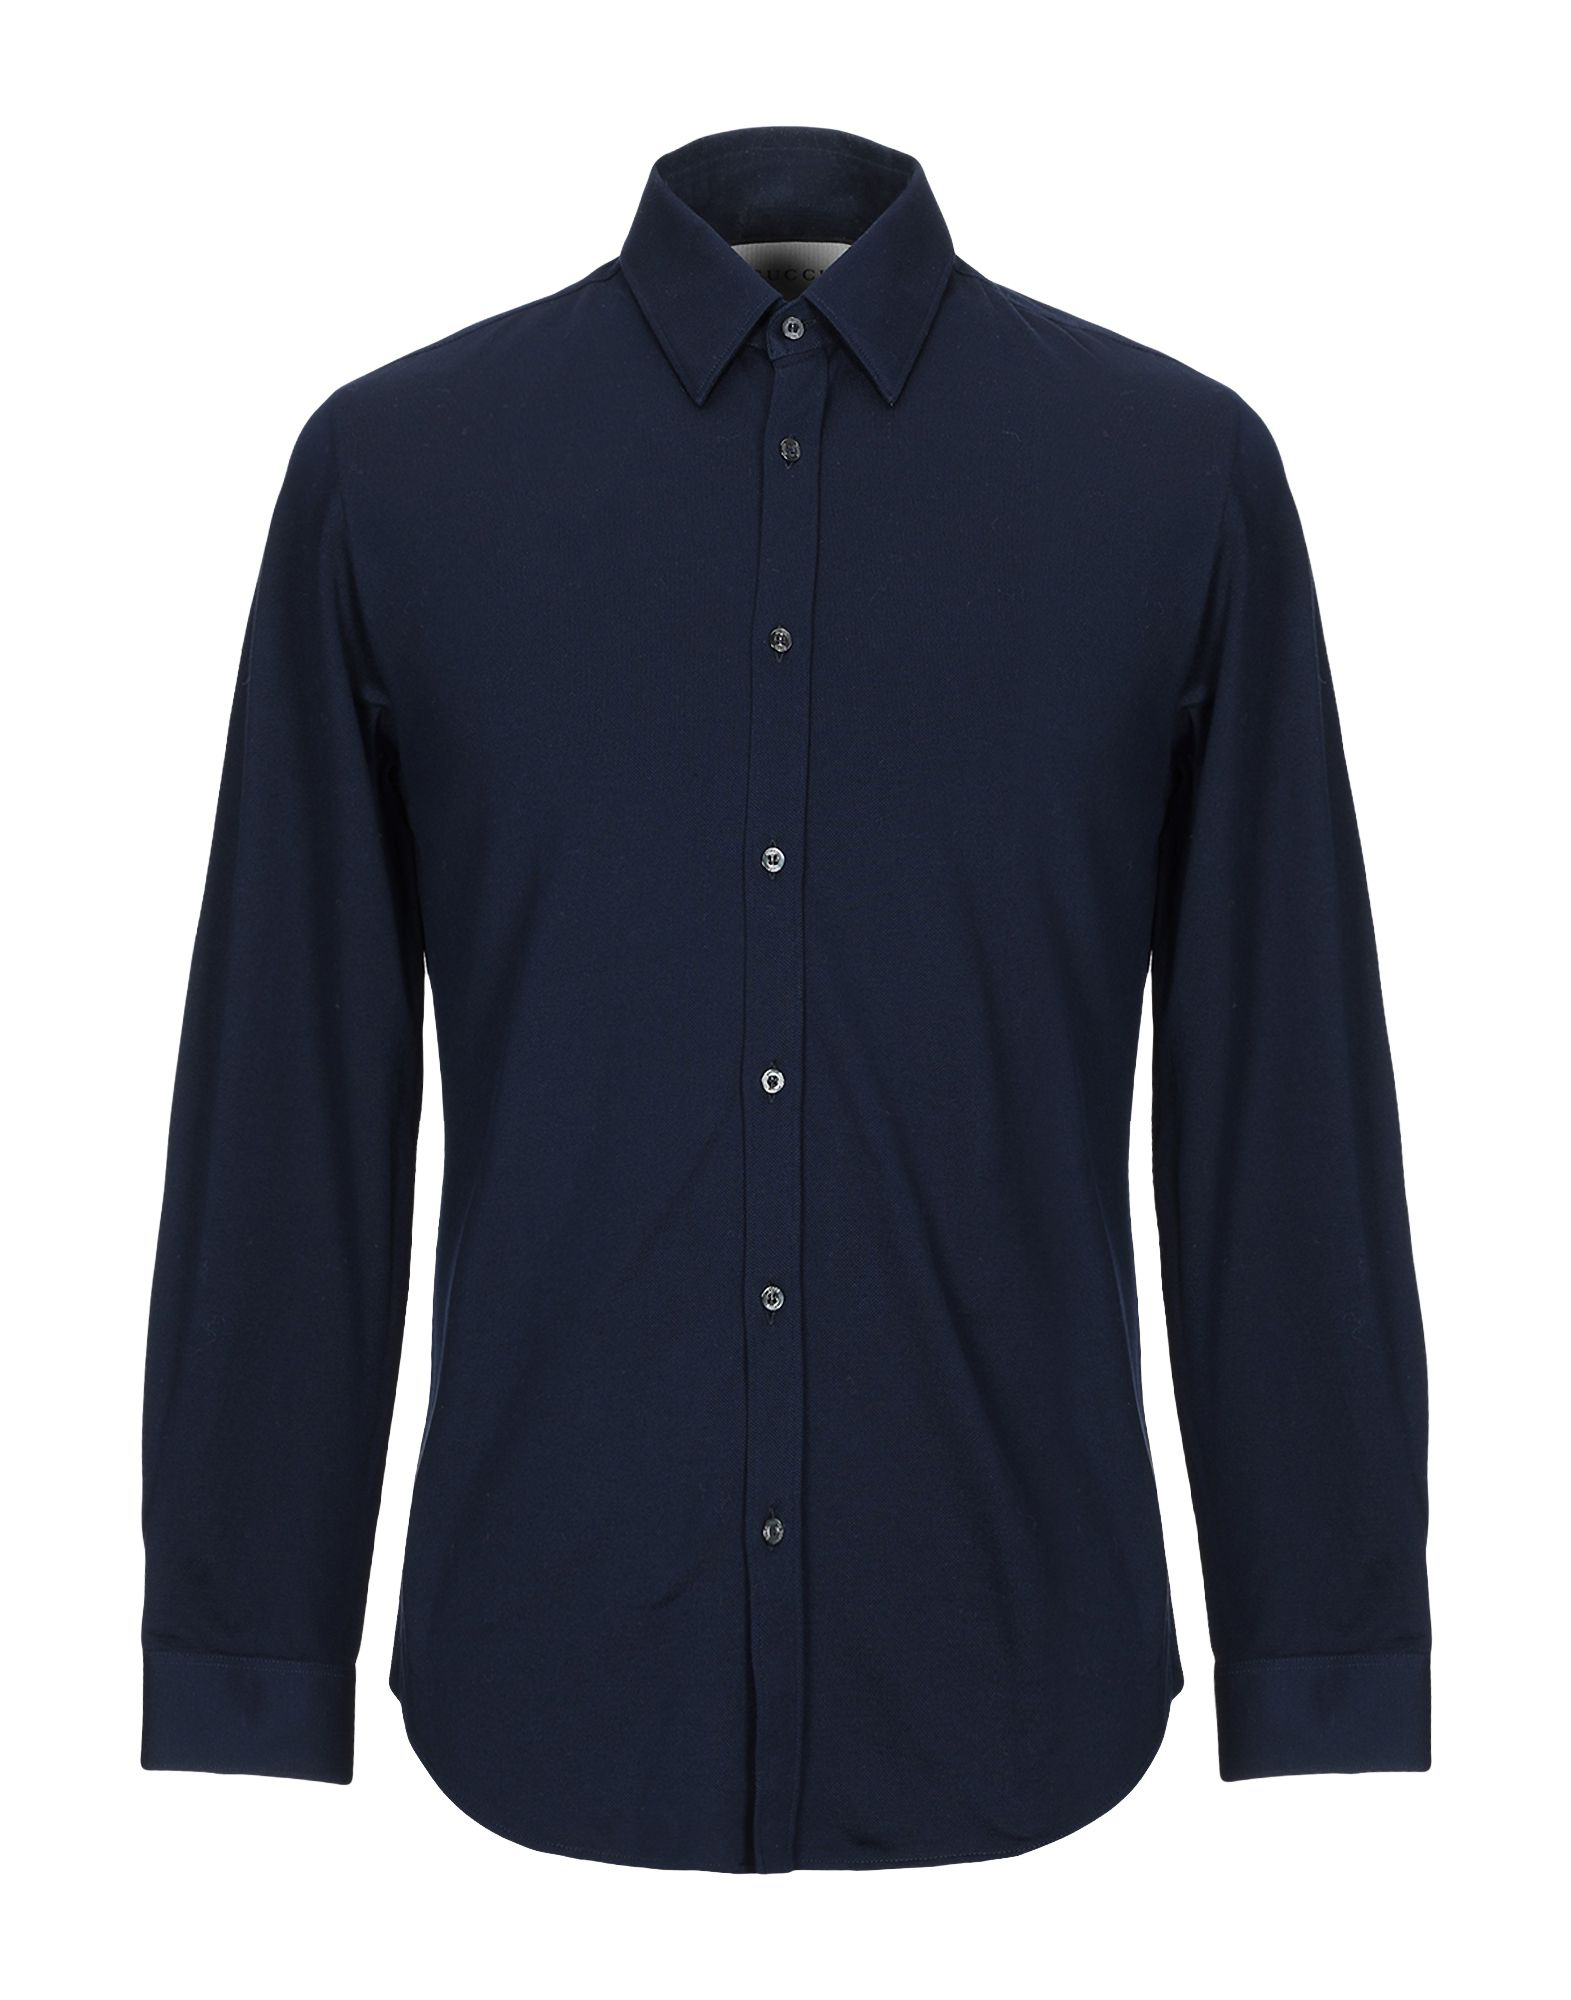 76e404b05c0c Gucci Shirts In Dark Blue | ModeSens